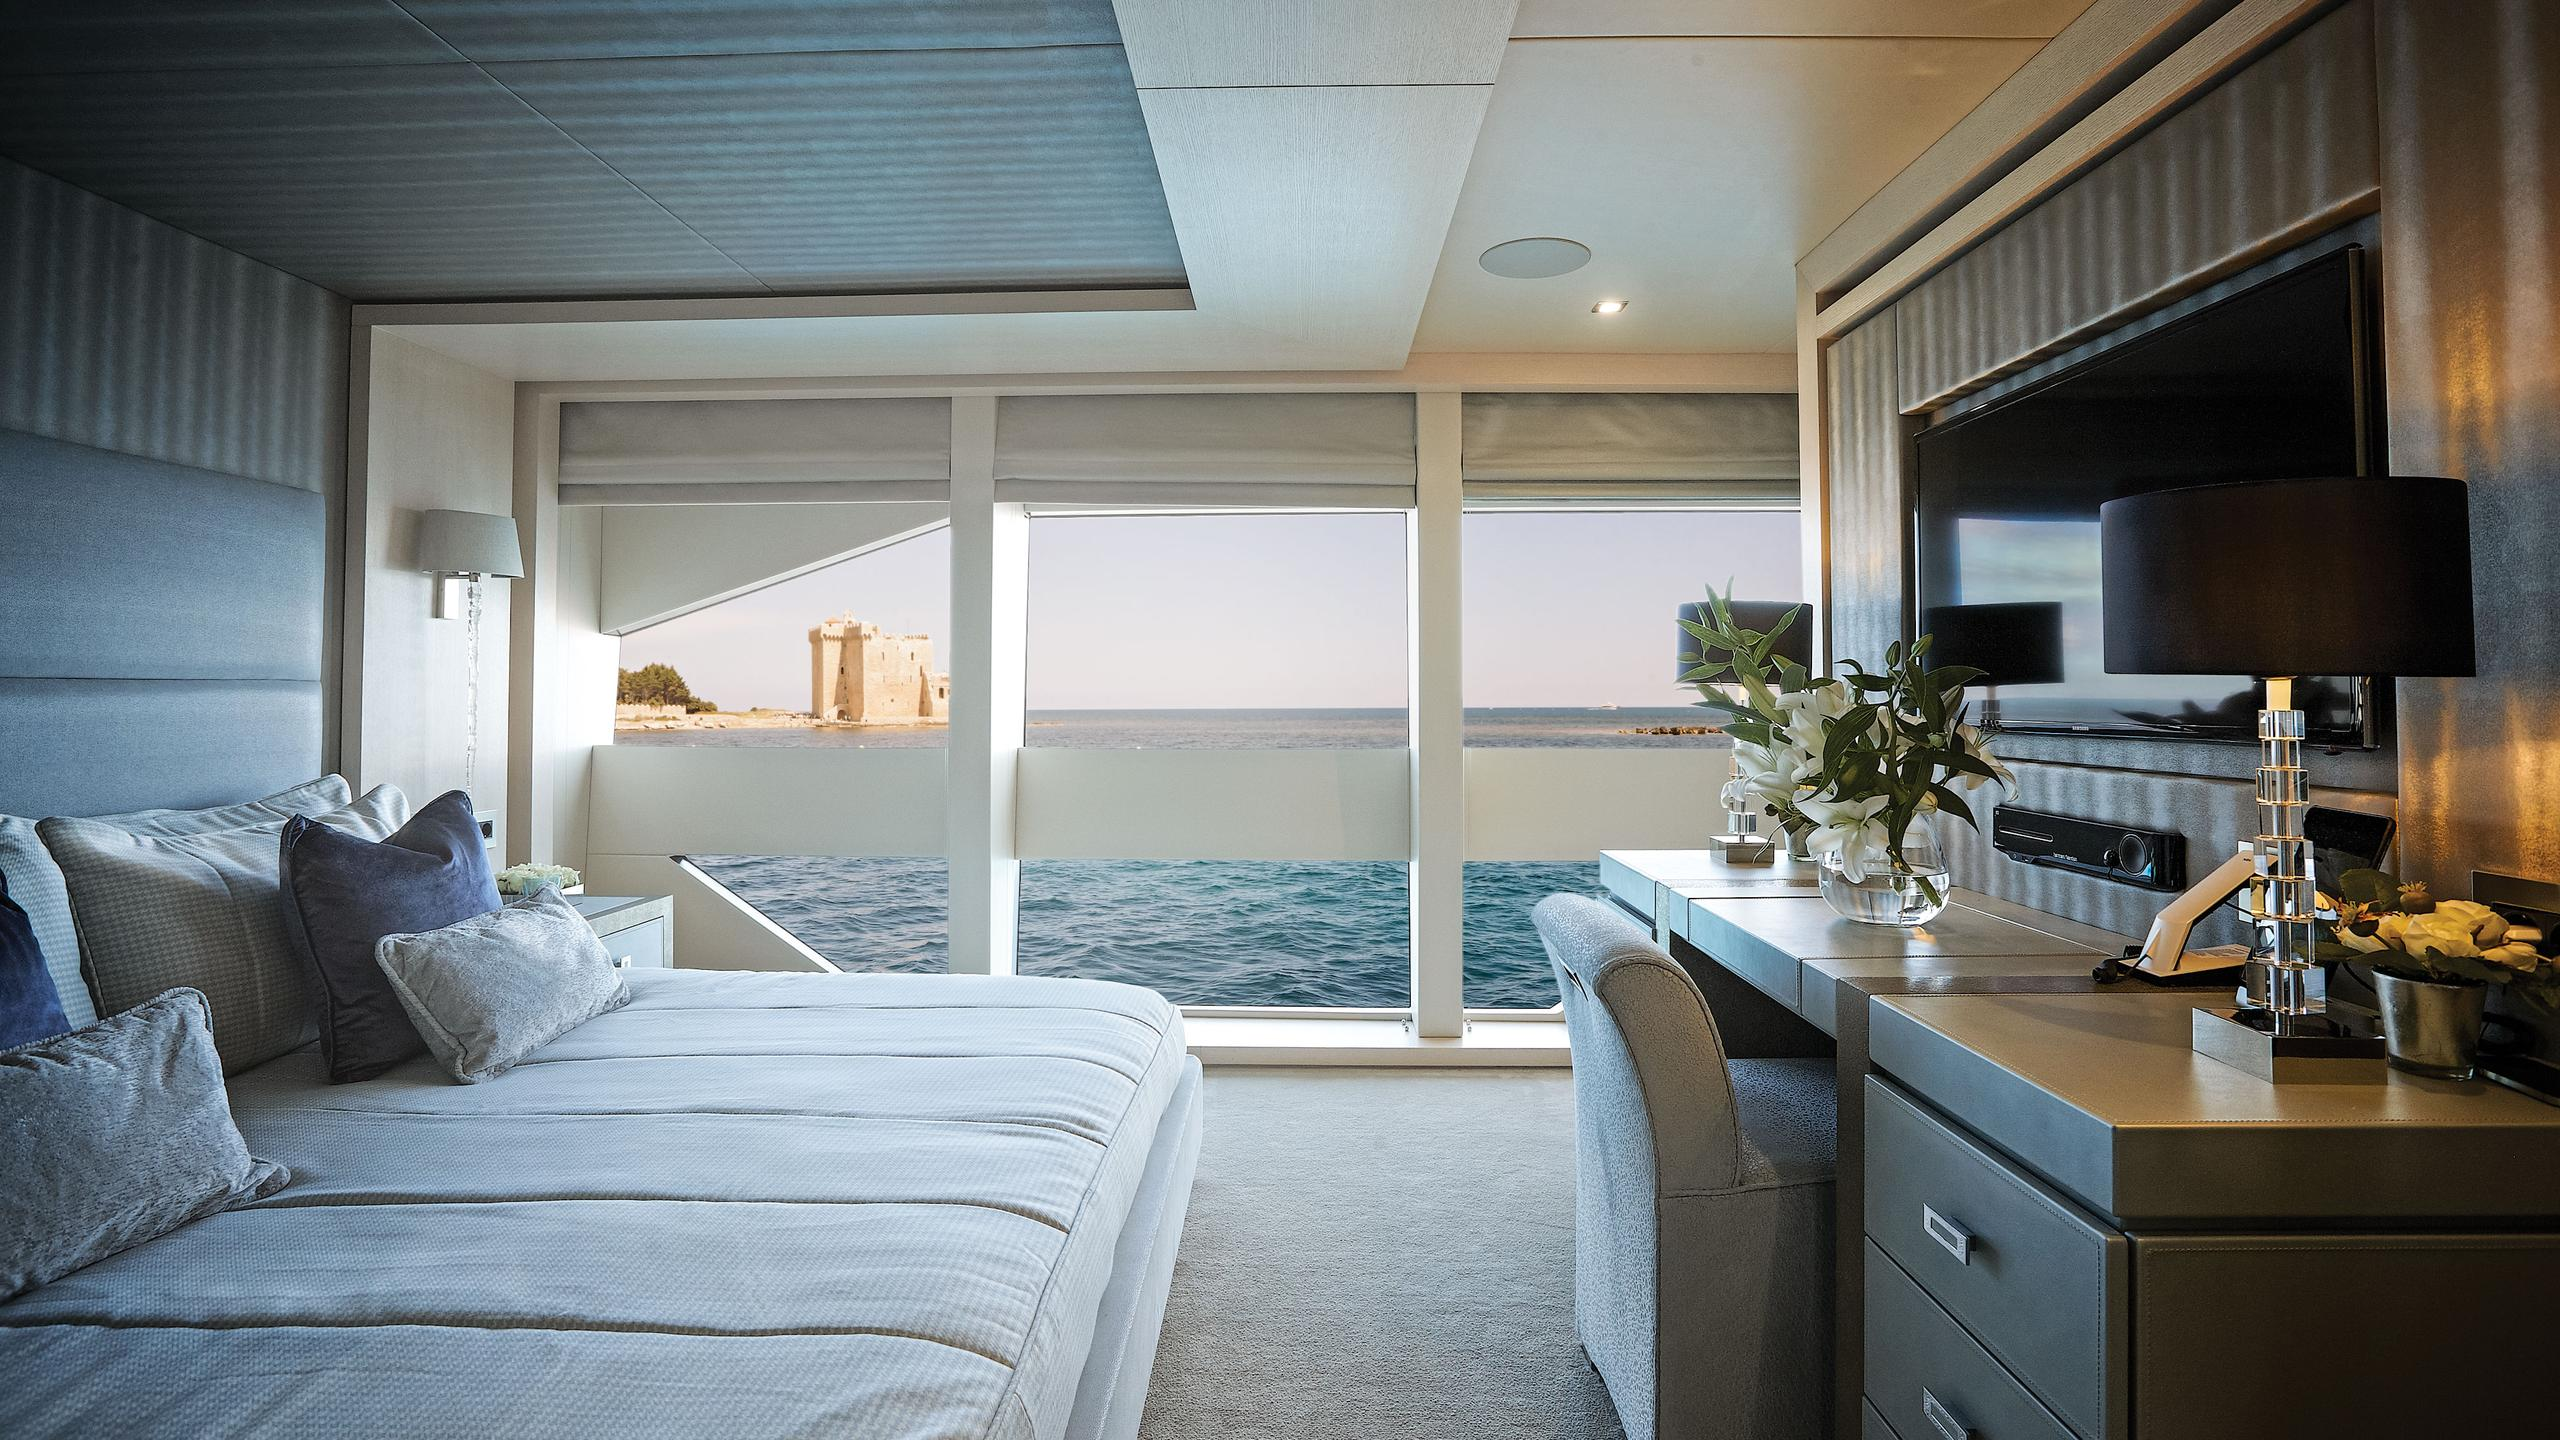 arados-blush-motor-yacht-sunseeker-2014-47m-guest-cabin